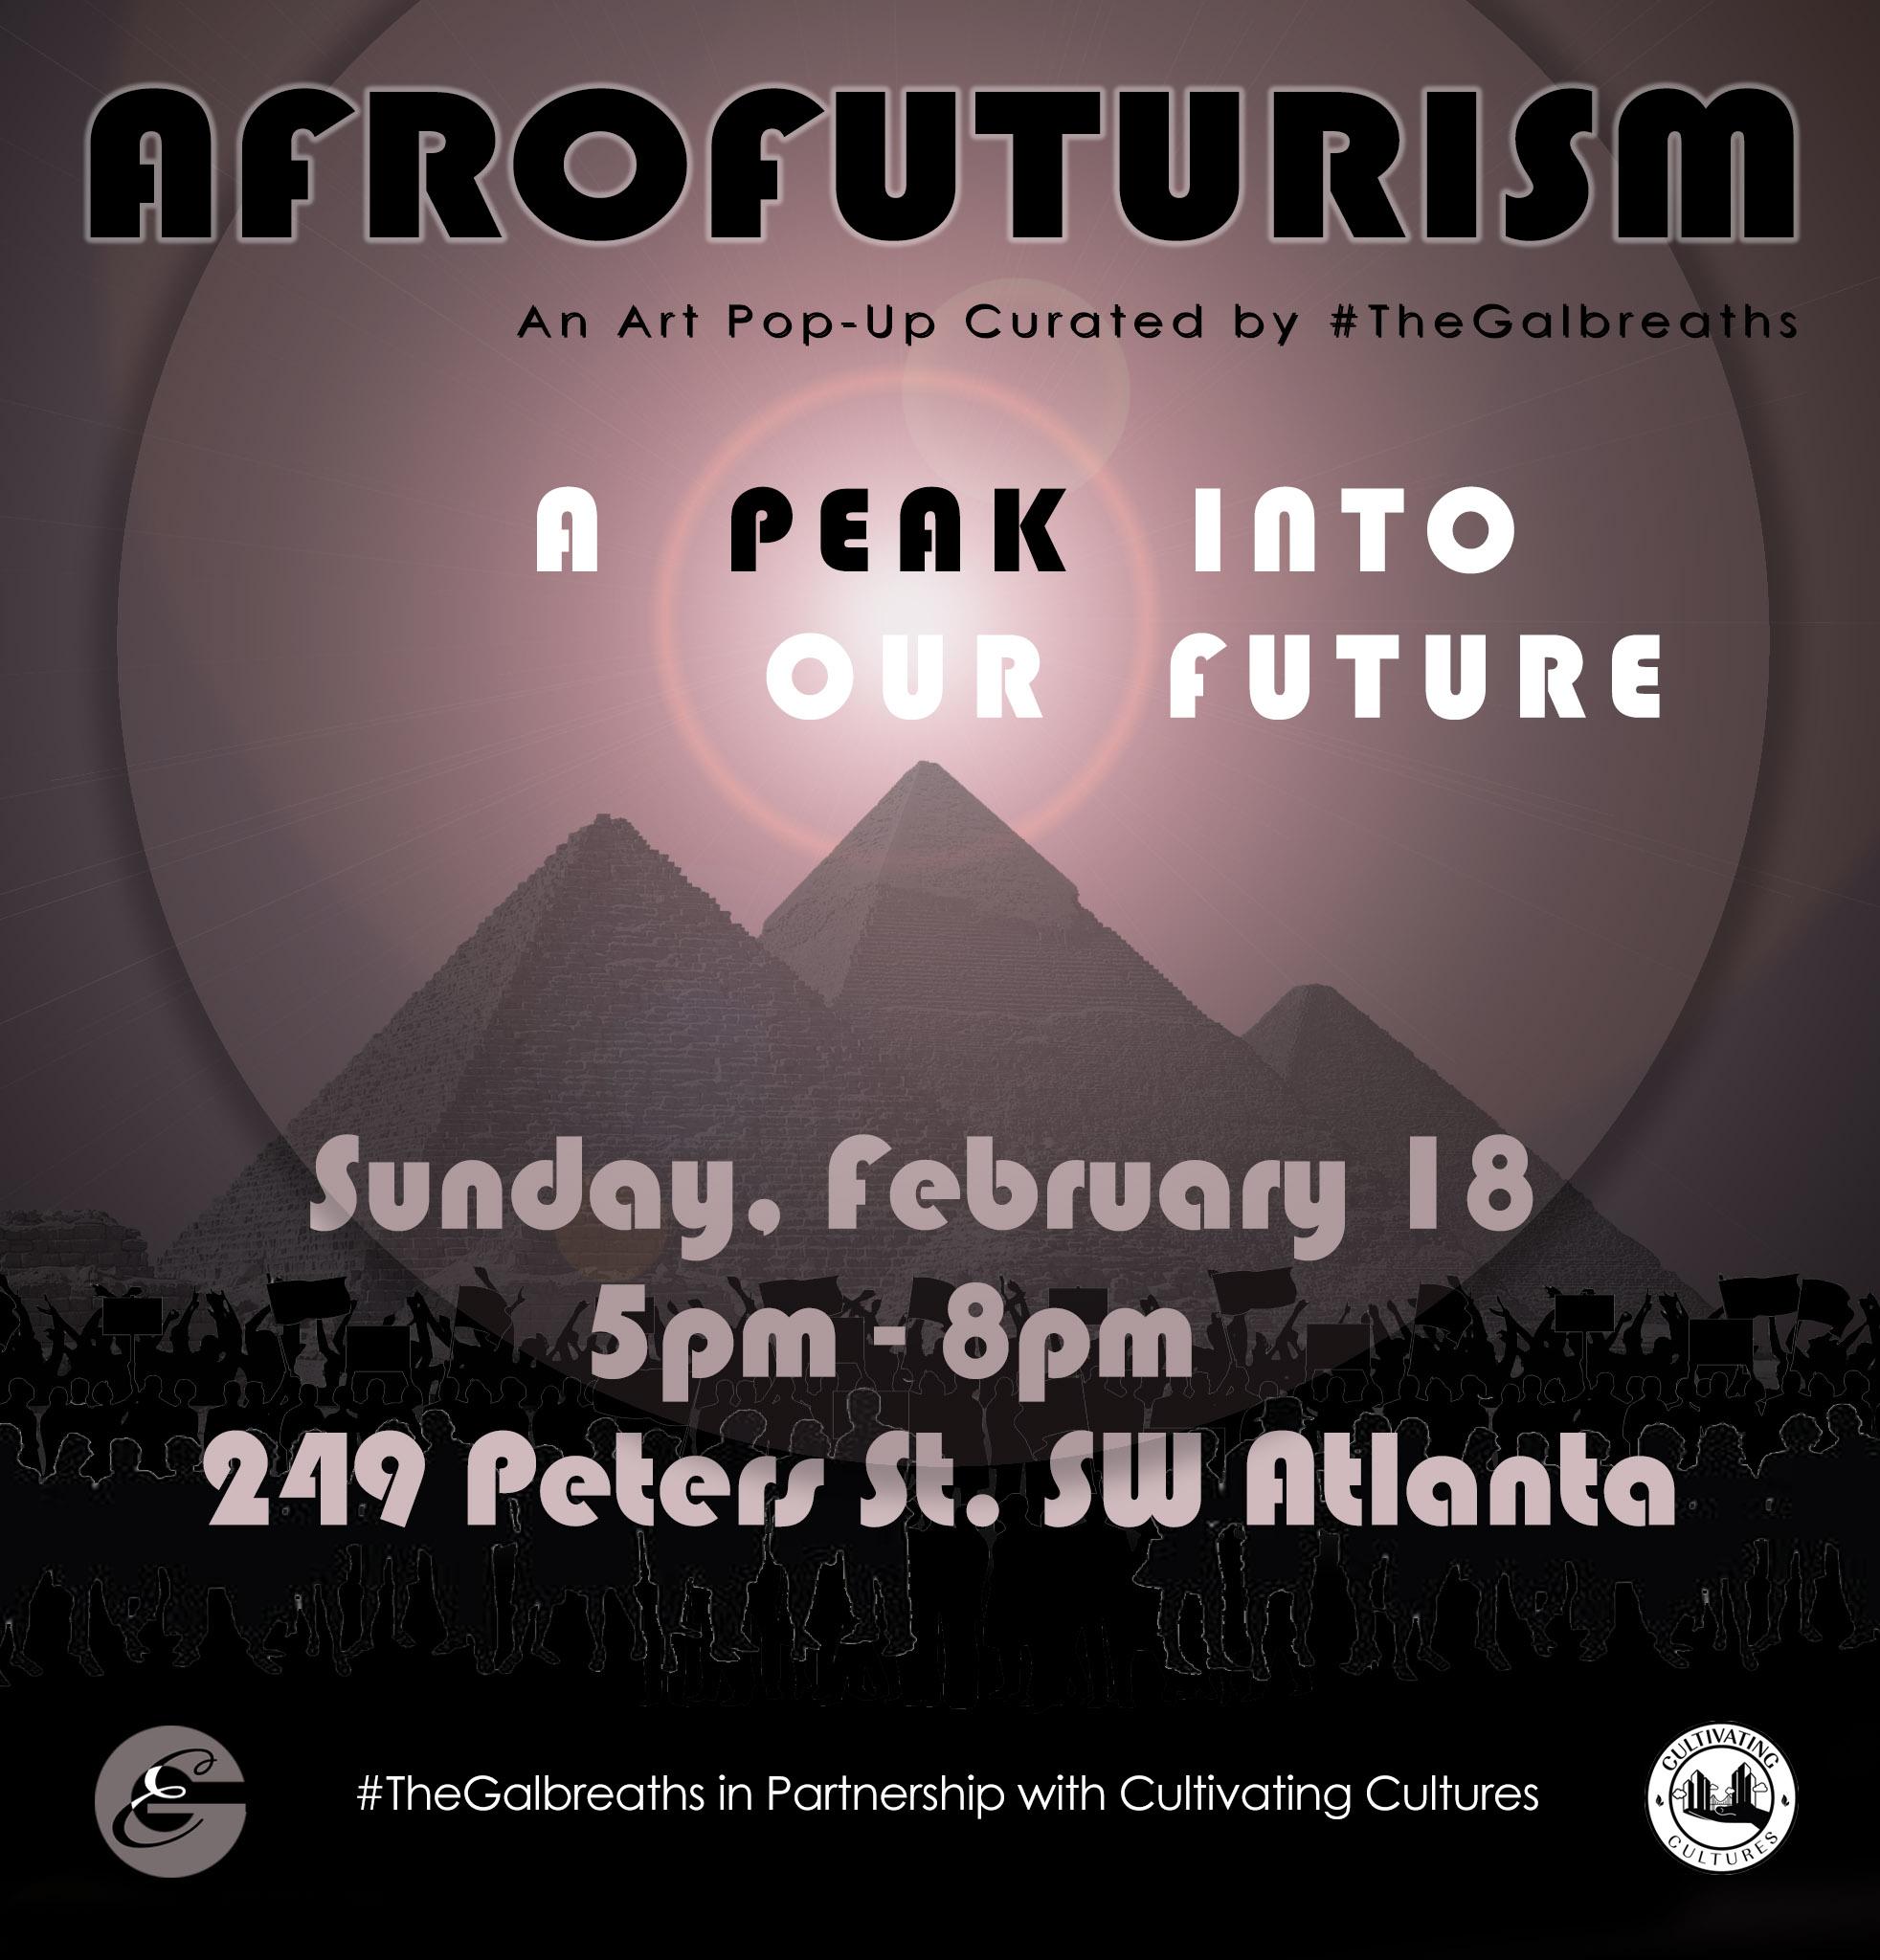 Afrofuturism flyer 4.jpg